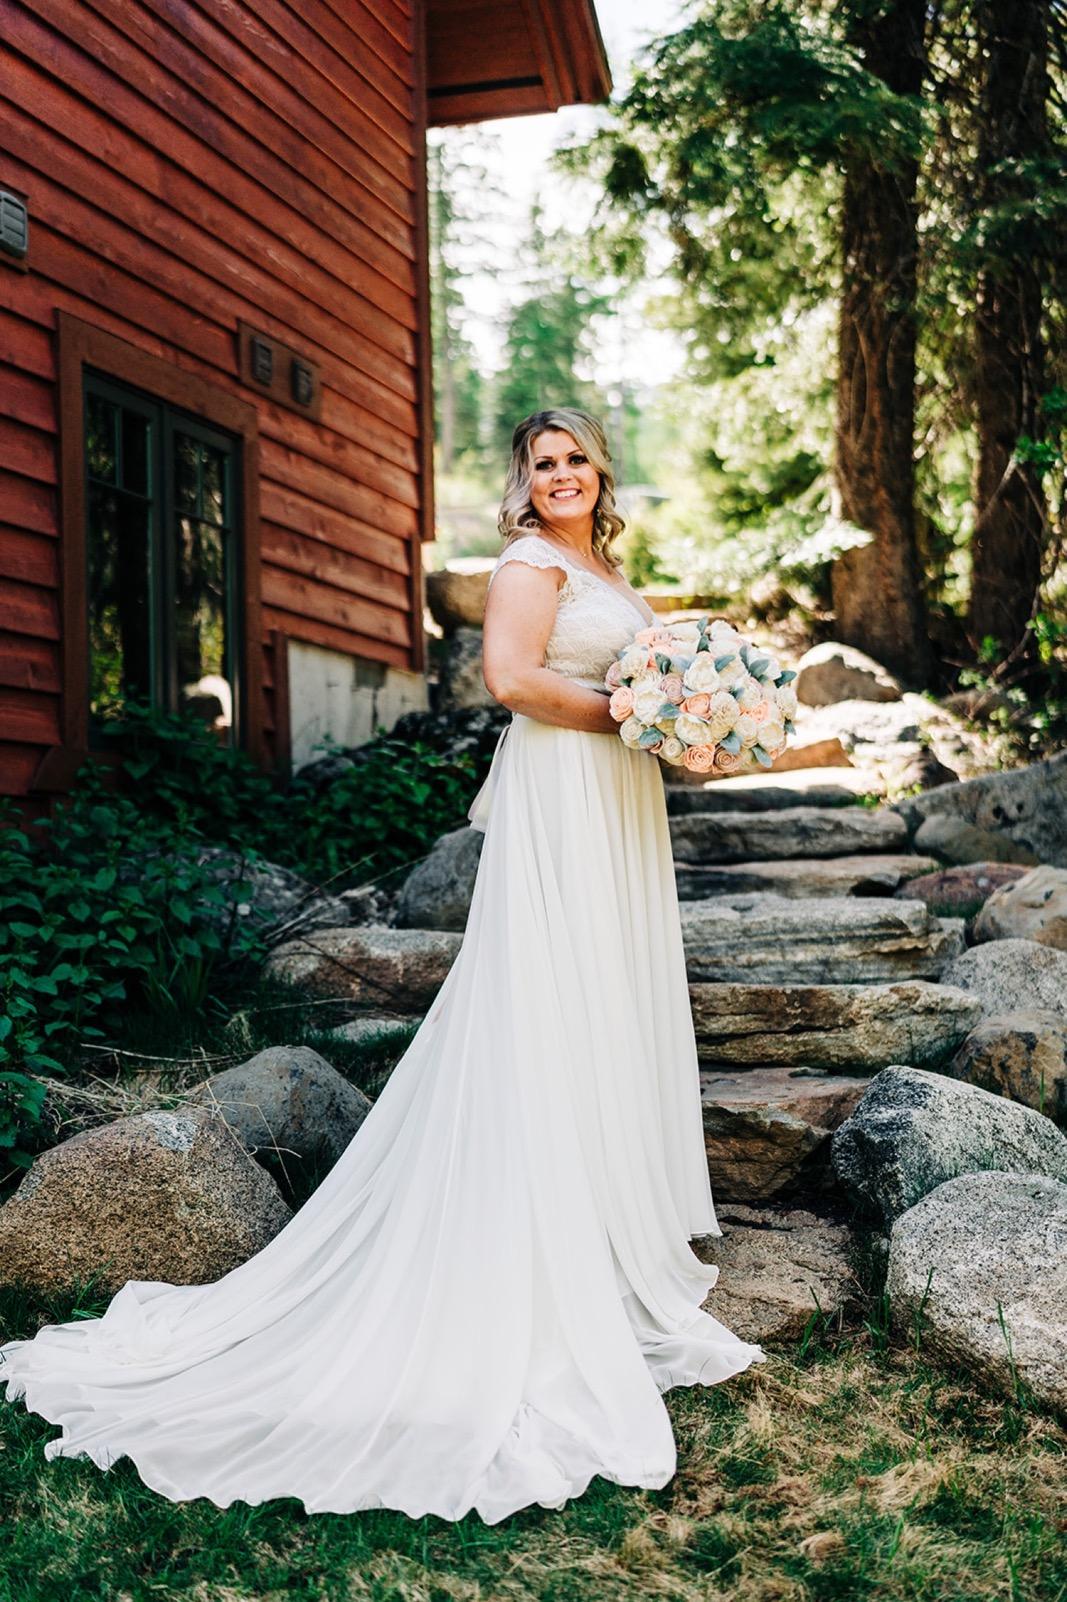 037_falissa_heather_wedding-105.jpg